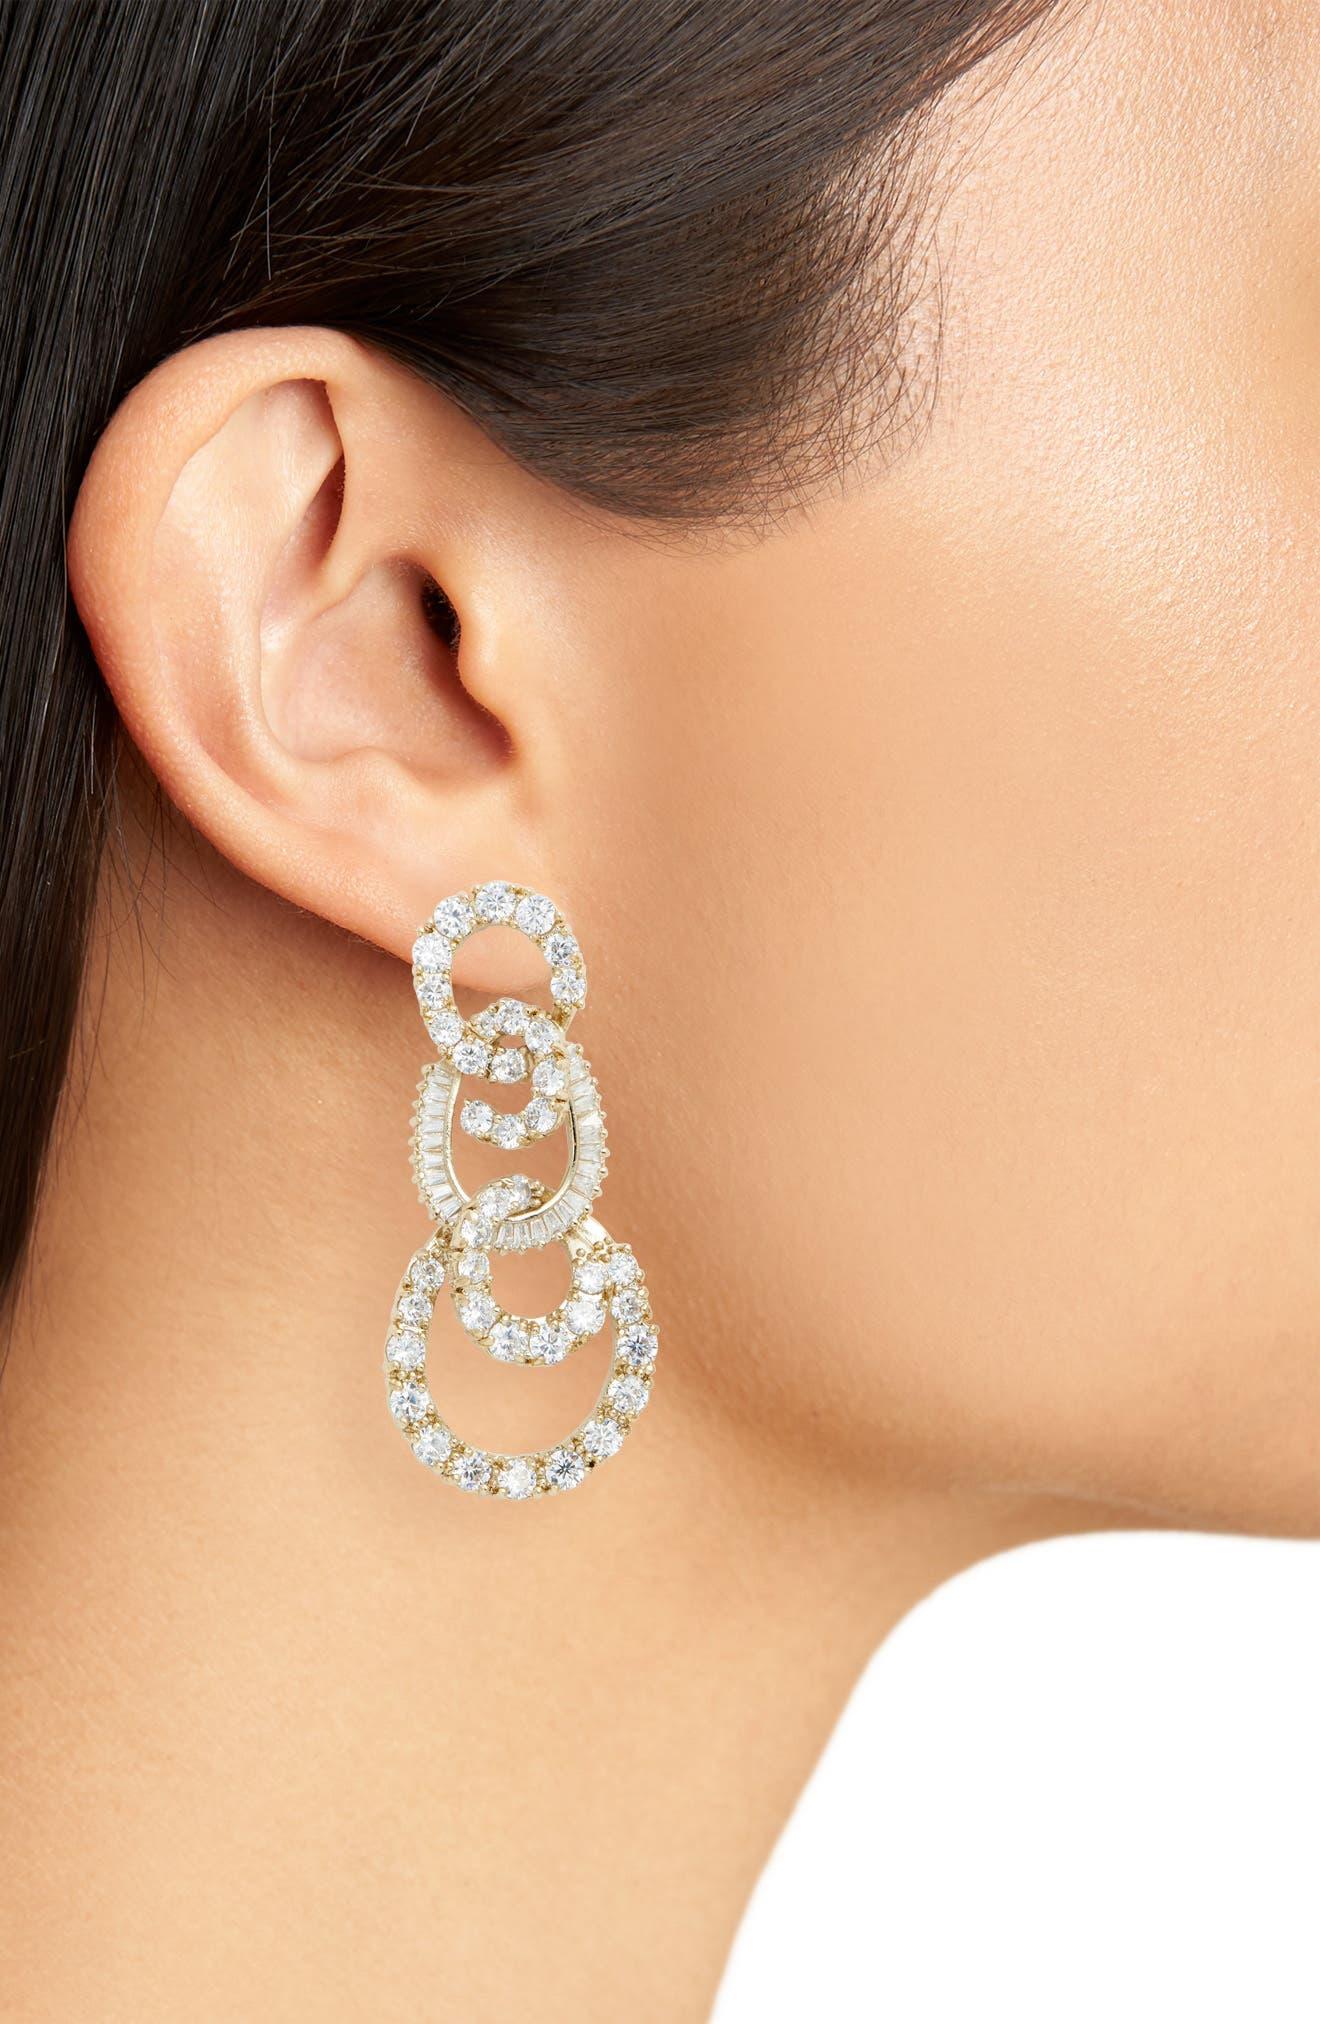 3-Tier Swirl Drop Earrings,                             Alternate thumbnail 2, color,                             WHITE/ GOLD